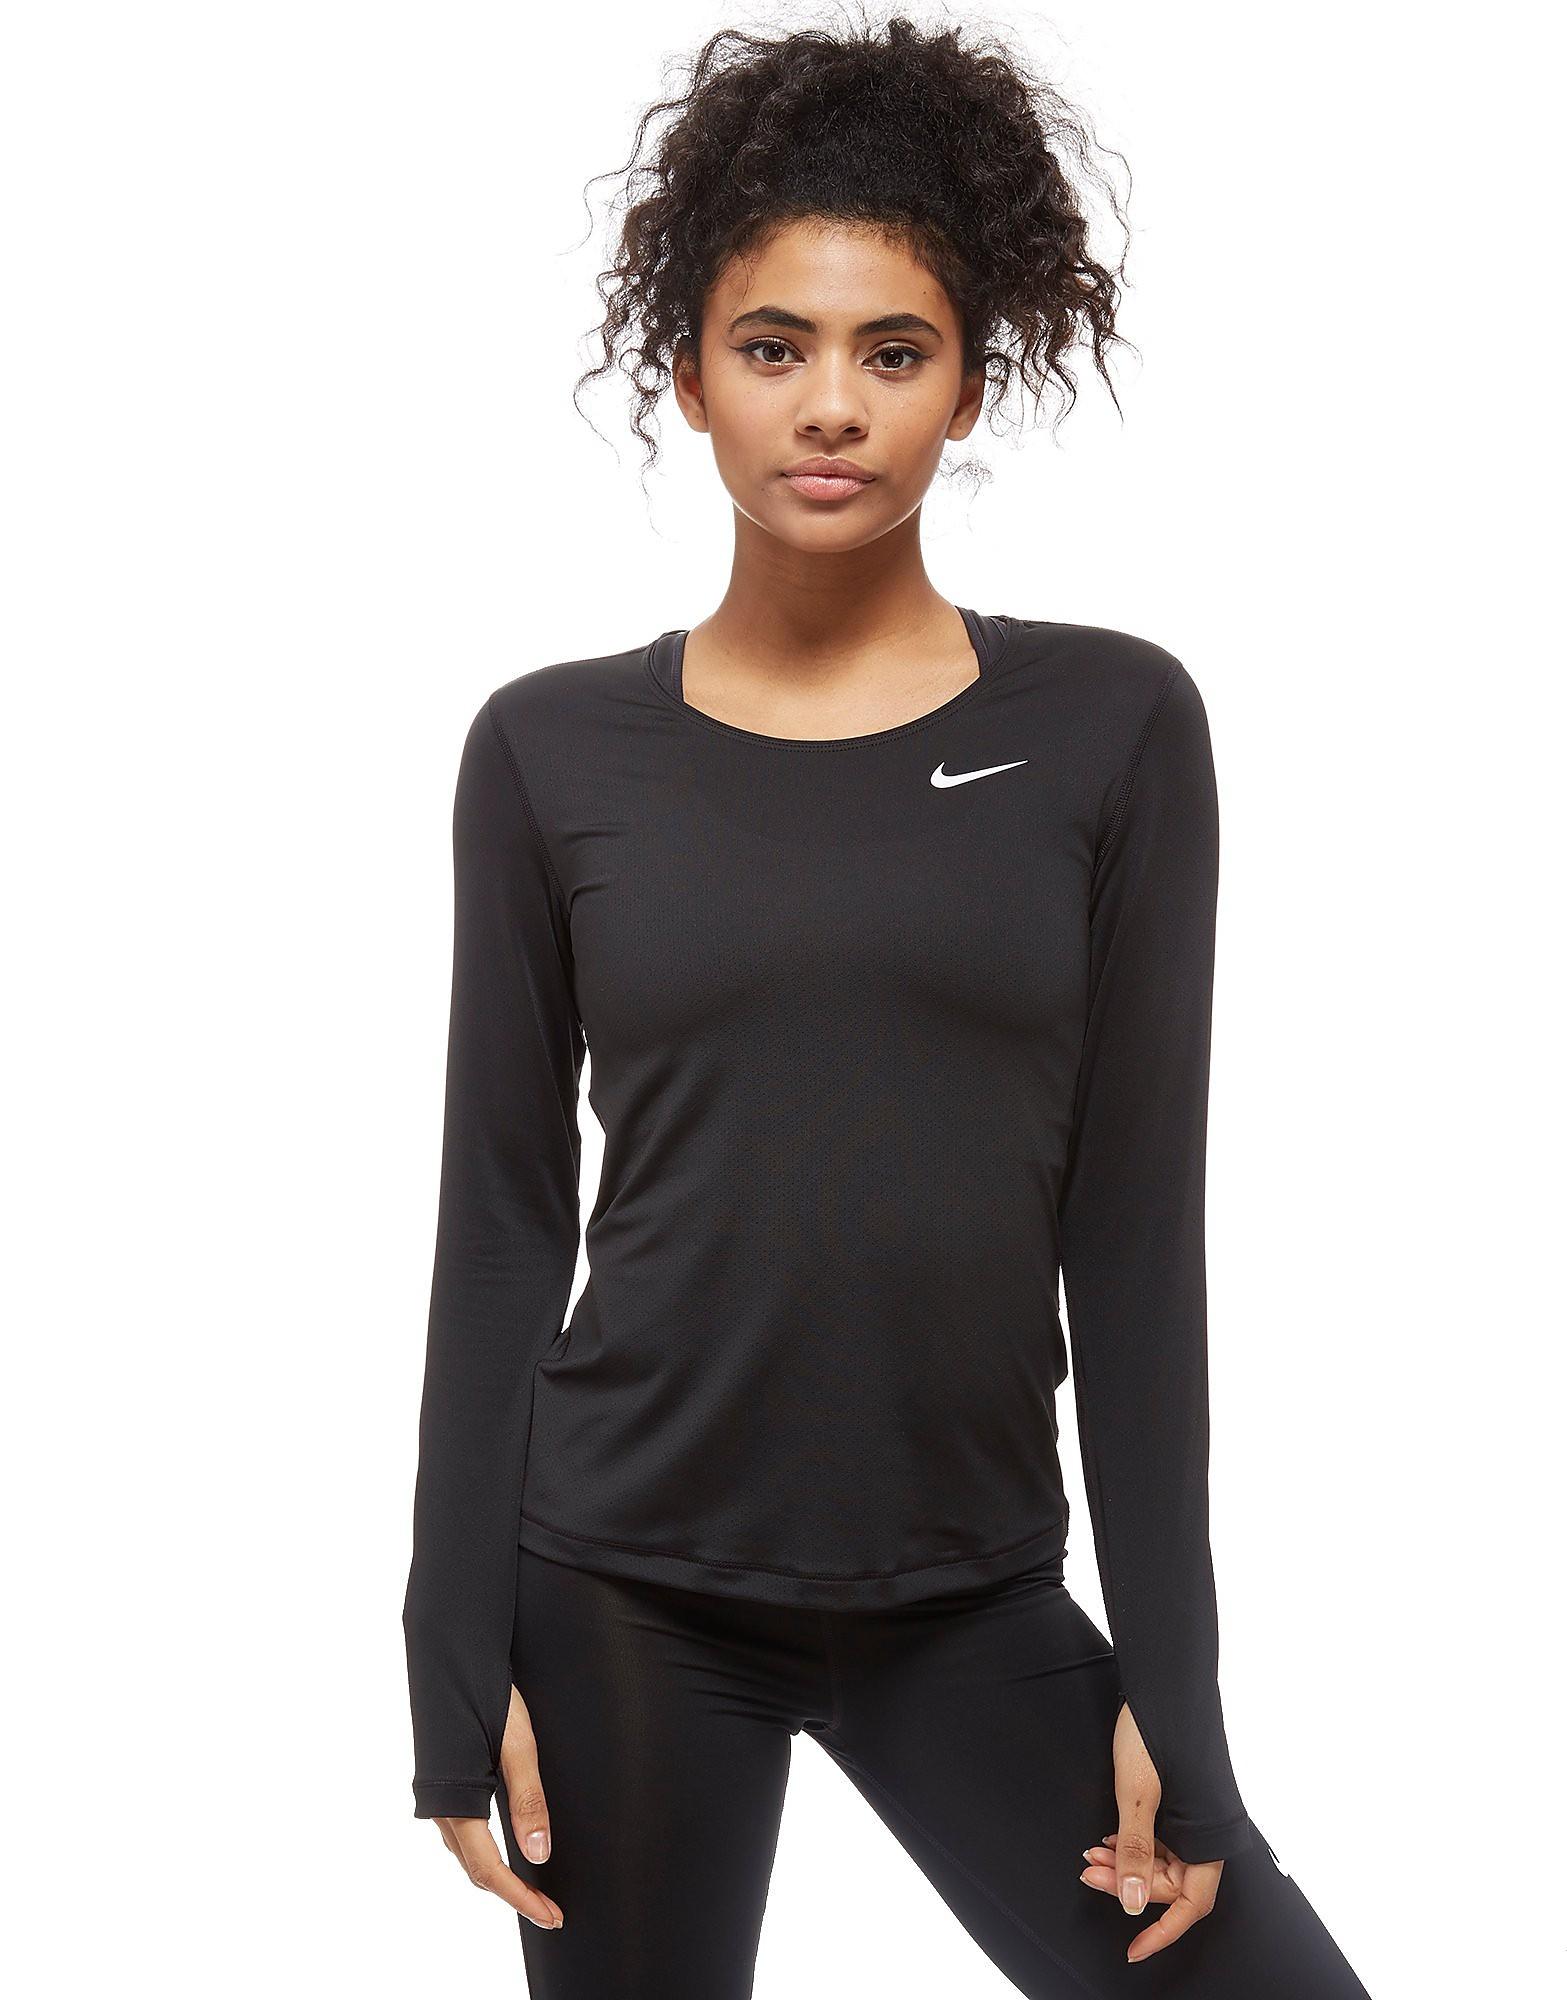 Nike Pro Long Sleeve Training Top